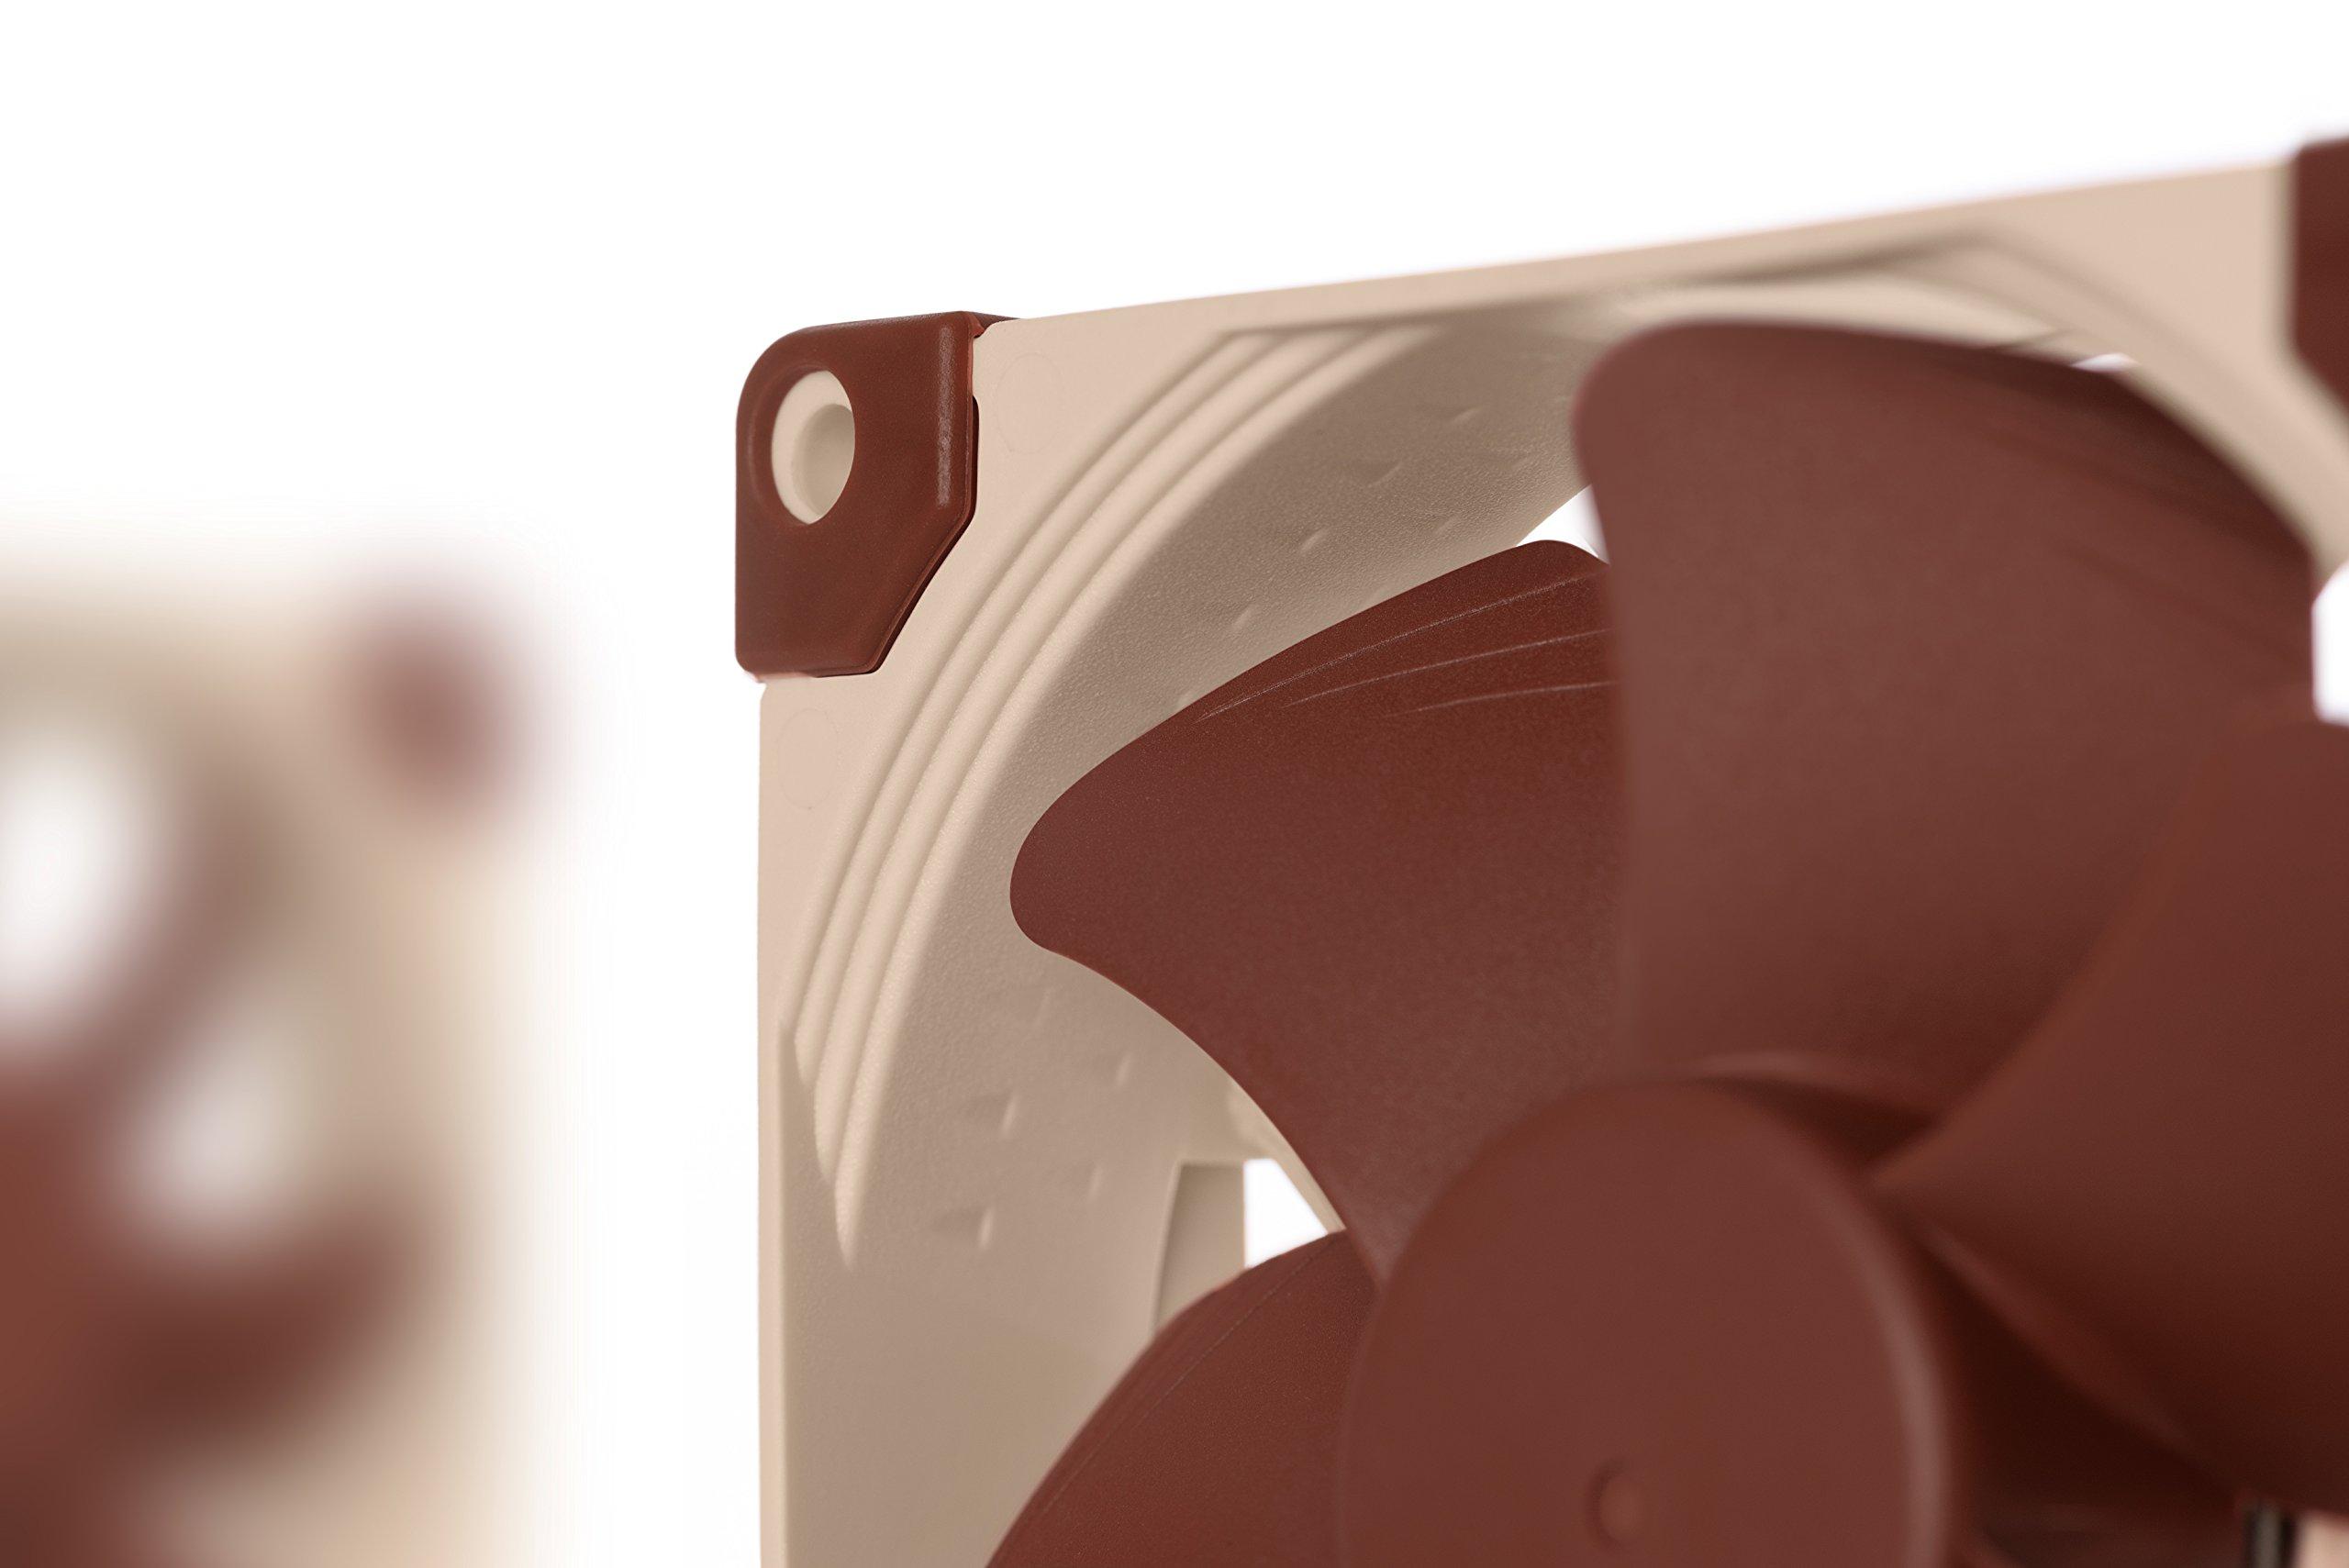 Noctua AAO Frame Design SSO2 Bearing Quiet Fan(NF-A9 PWM) by noctua (Image #6)